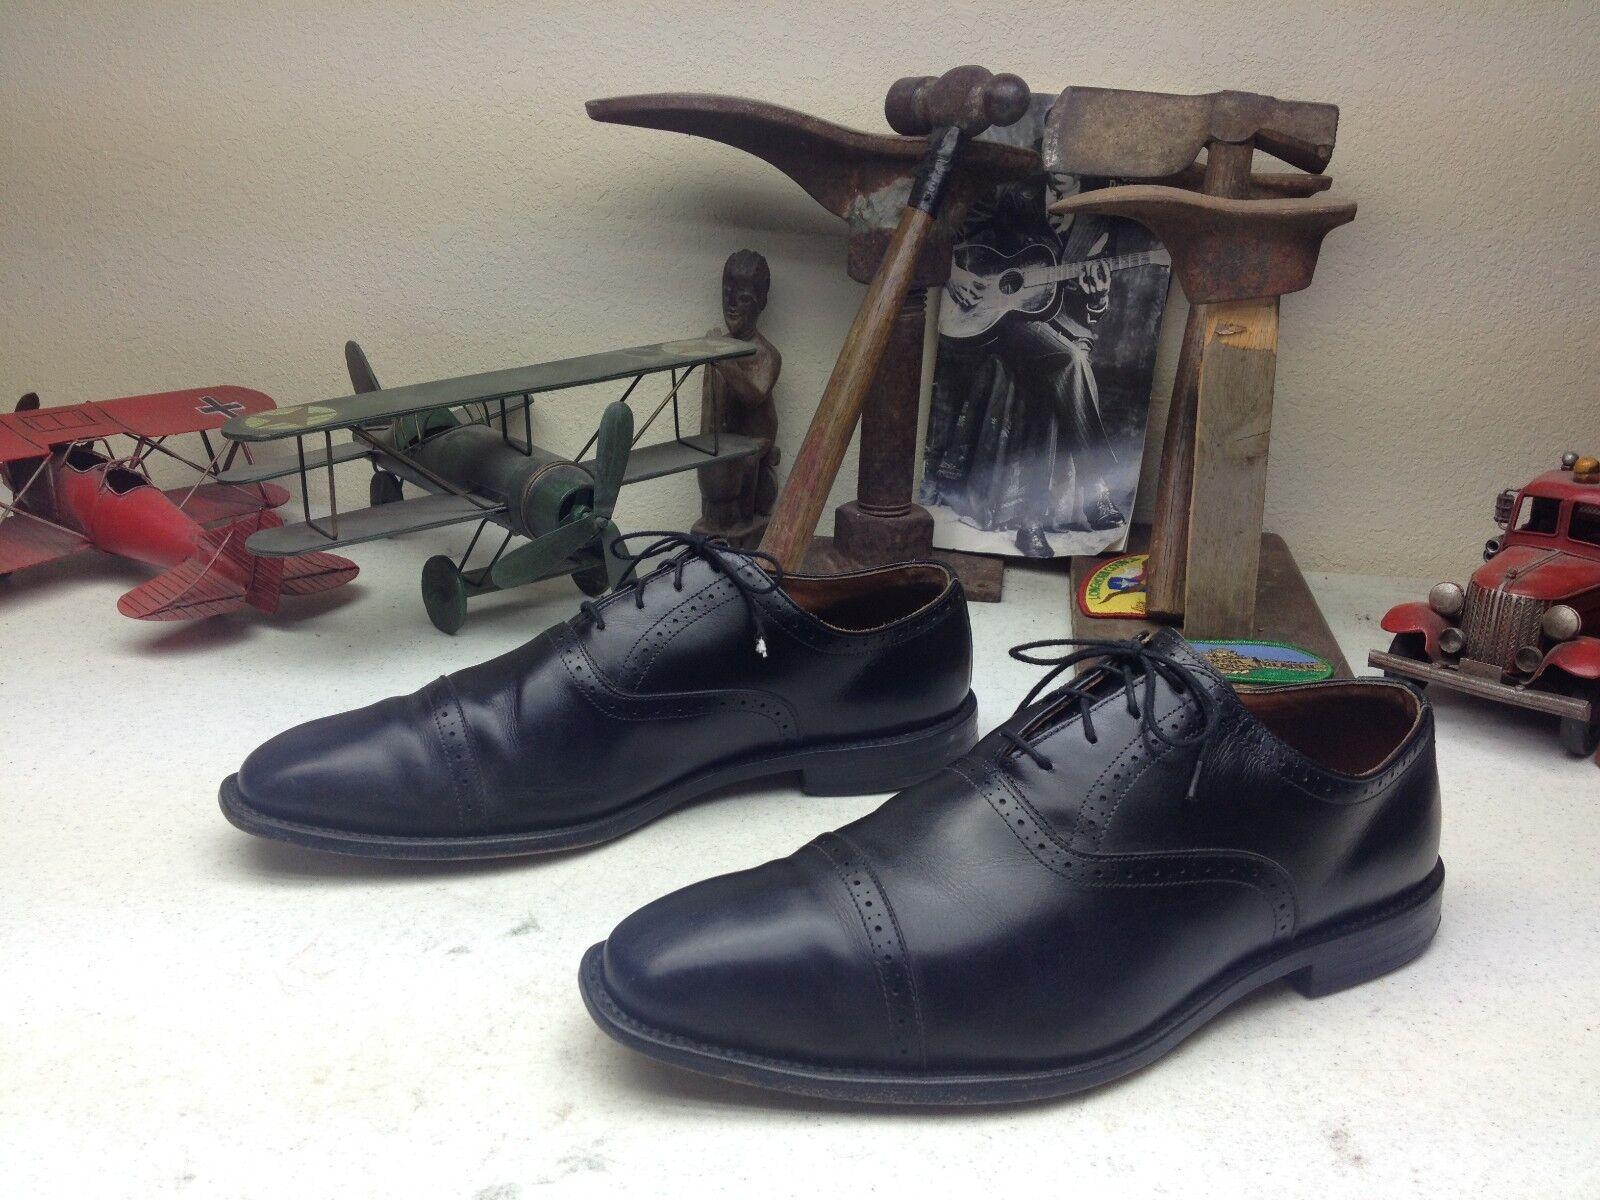 Hecho en EE. UU. Vintage ALLEN EDMONDS EVANSTON Negro Cuero BOSS Zapatos 11.5 D POWER